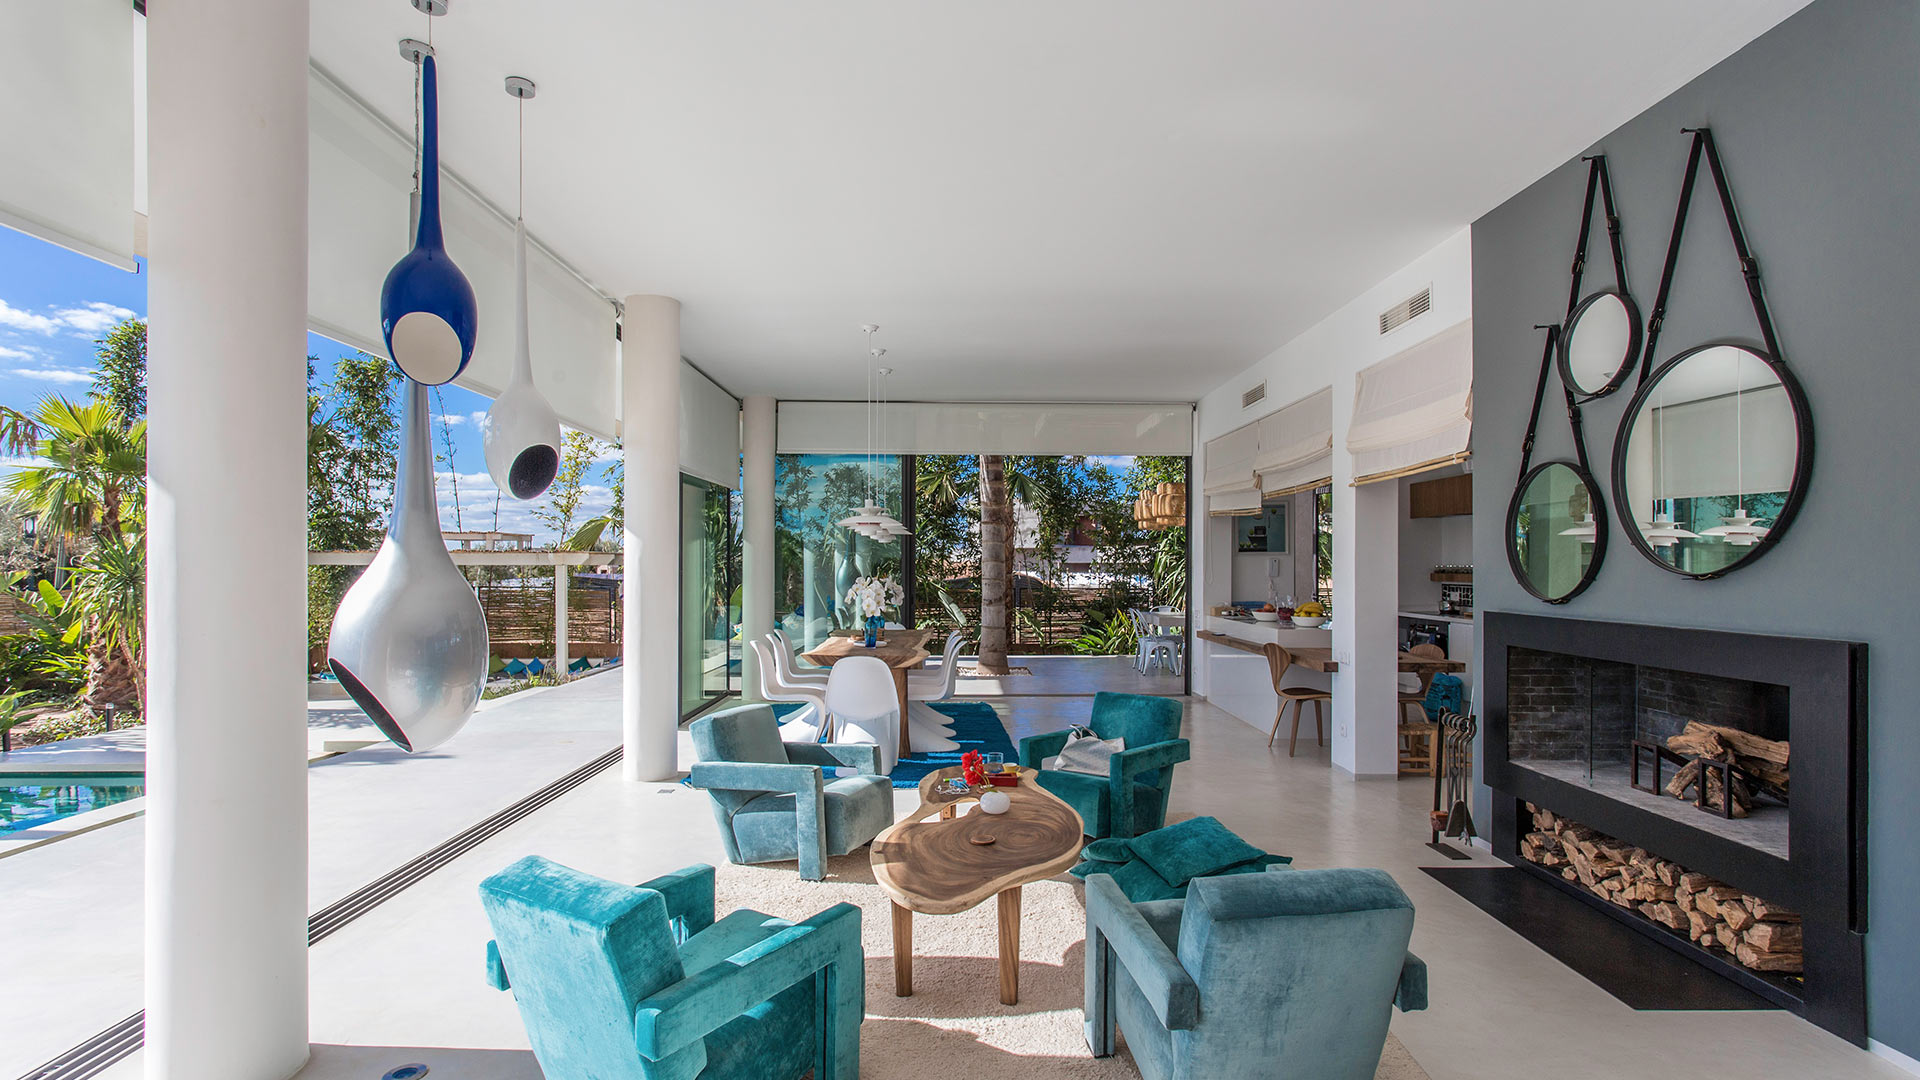 marrakech-villa-elea-13315458355c123801618257.30746107.1920